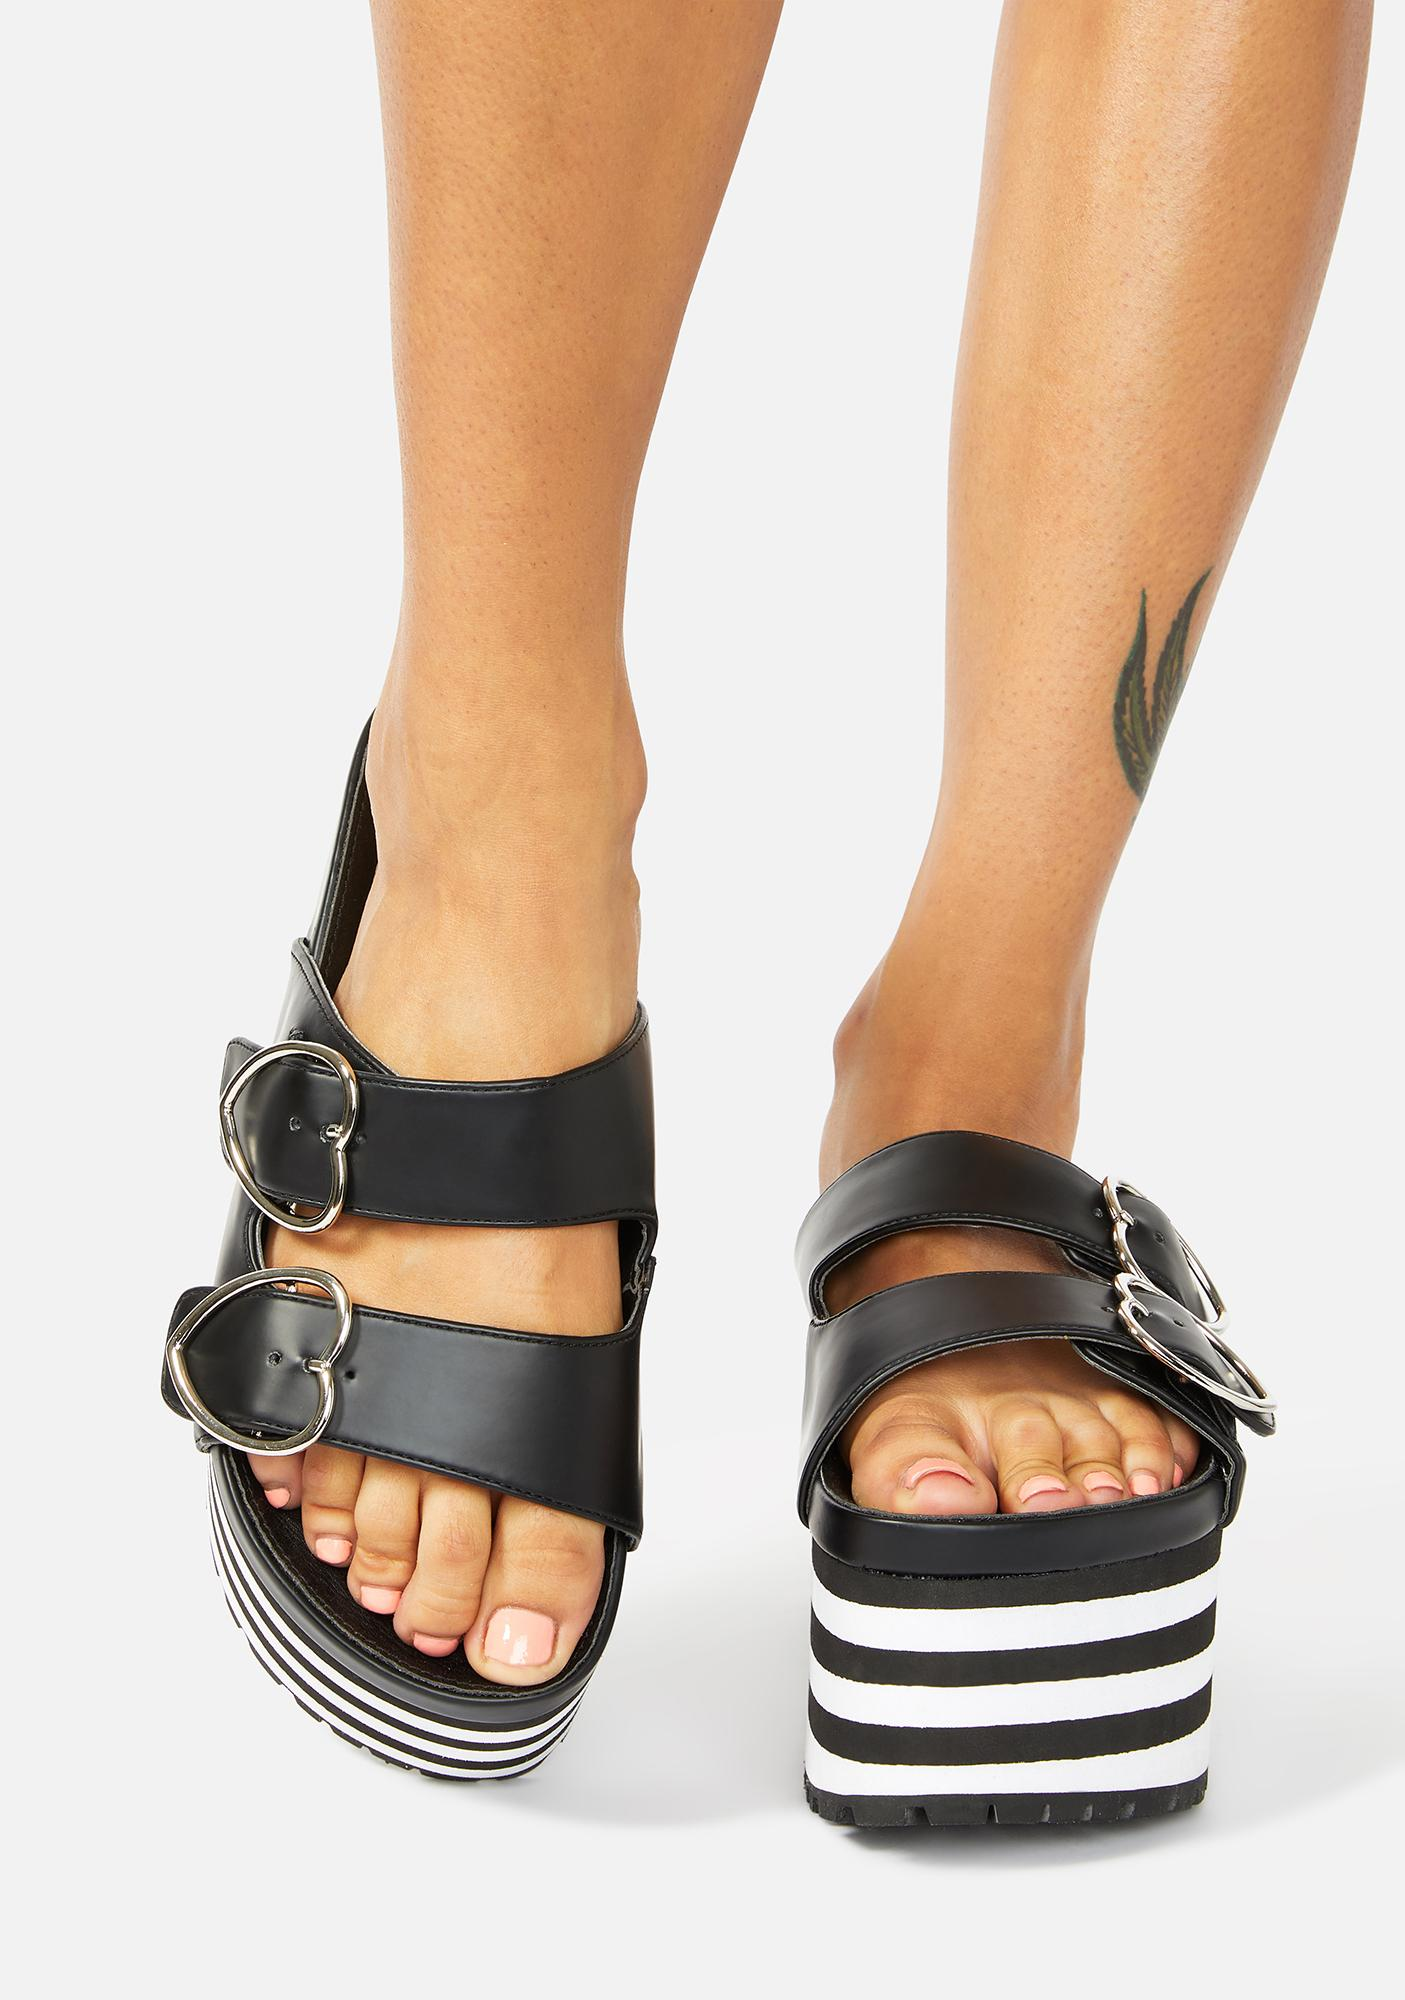 Charla Tedrick Lovesick Striped Platform Sandals